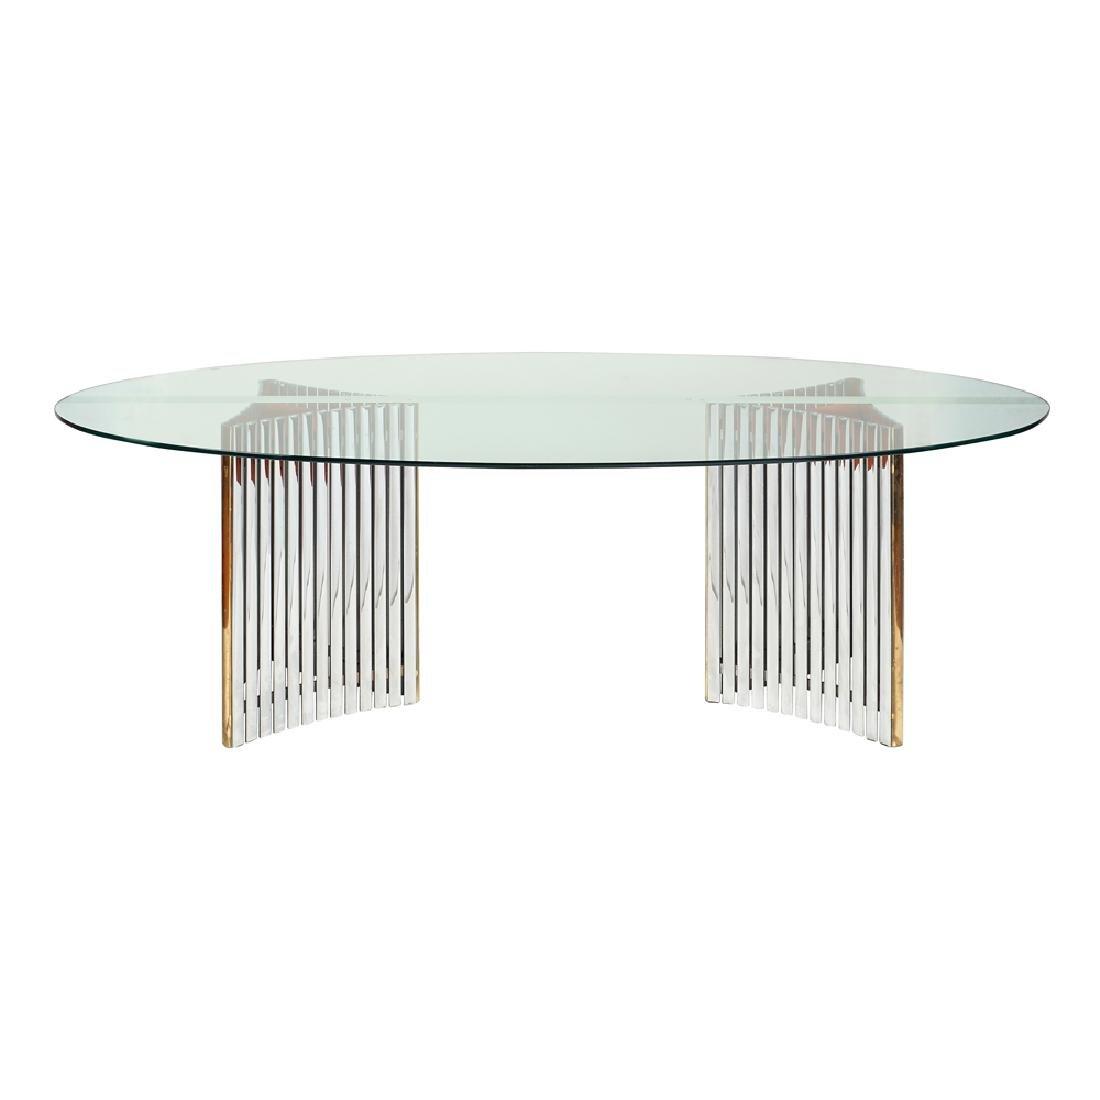 Centerpiece design table 20th century 72x238x110 cm.